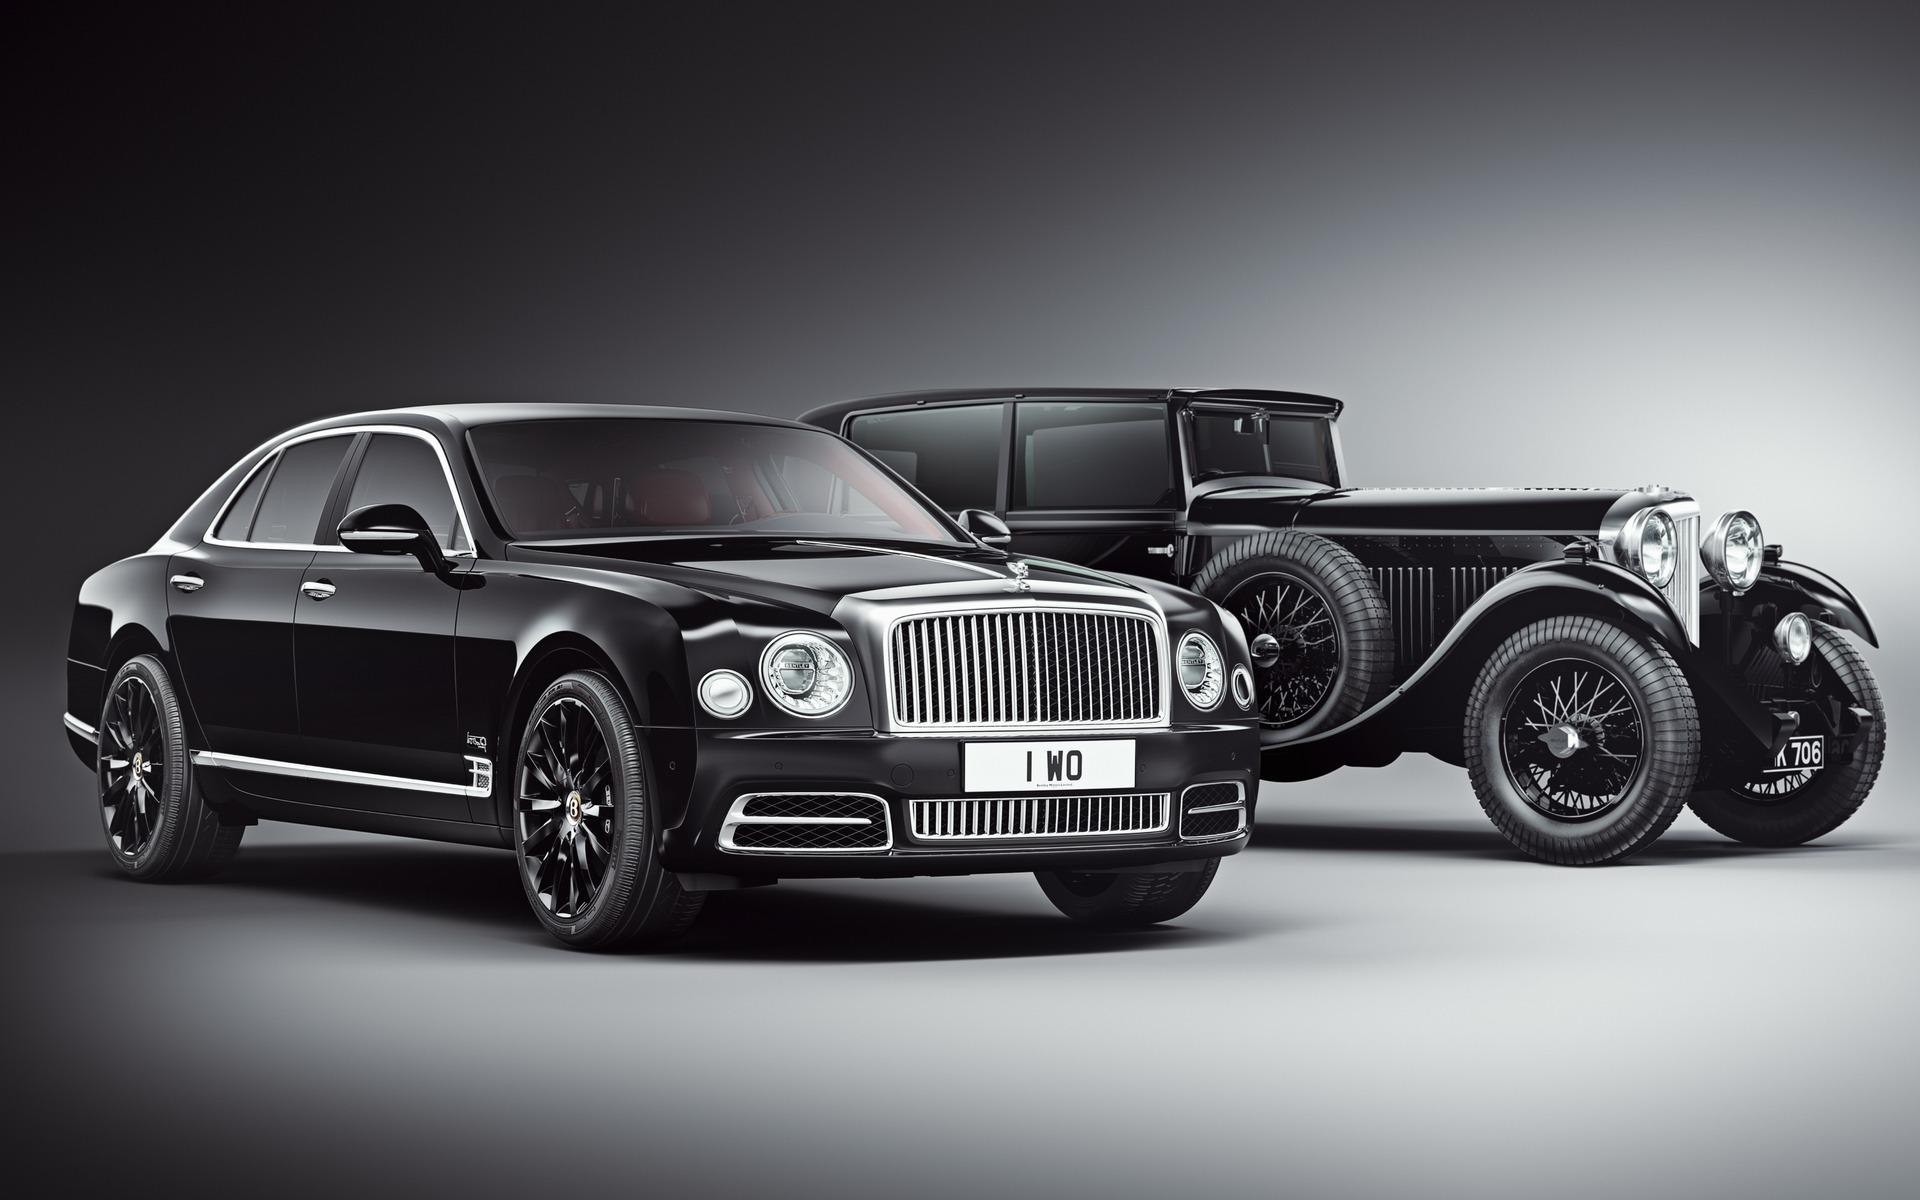 Bentley, celebrates, 100-years, Mulsanne Walter Owen, Edition, NewsMobile, Mobile News, India, Auto, Car